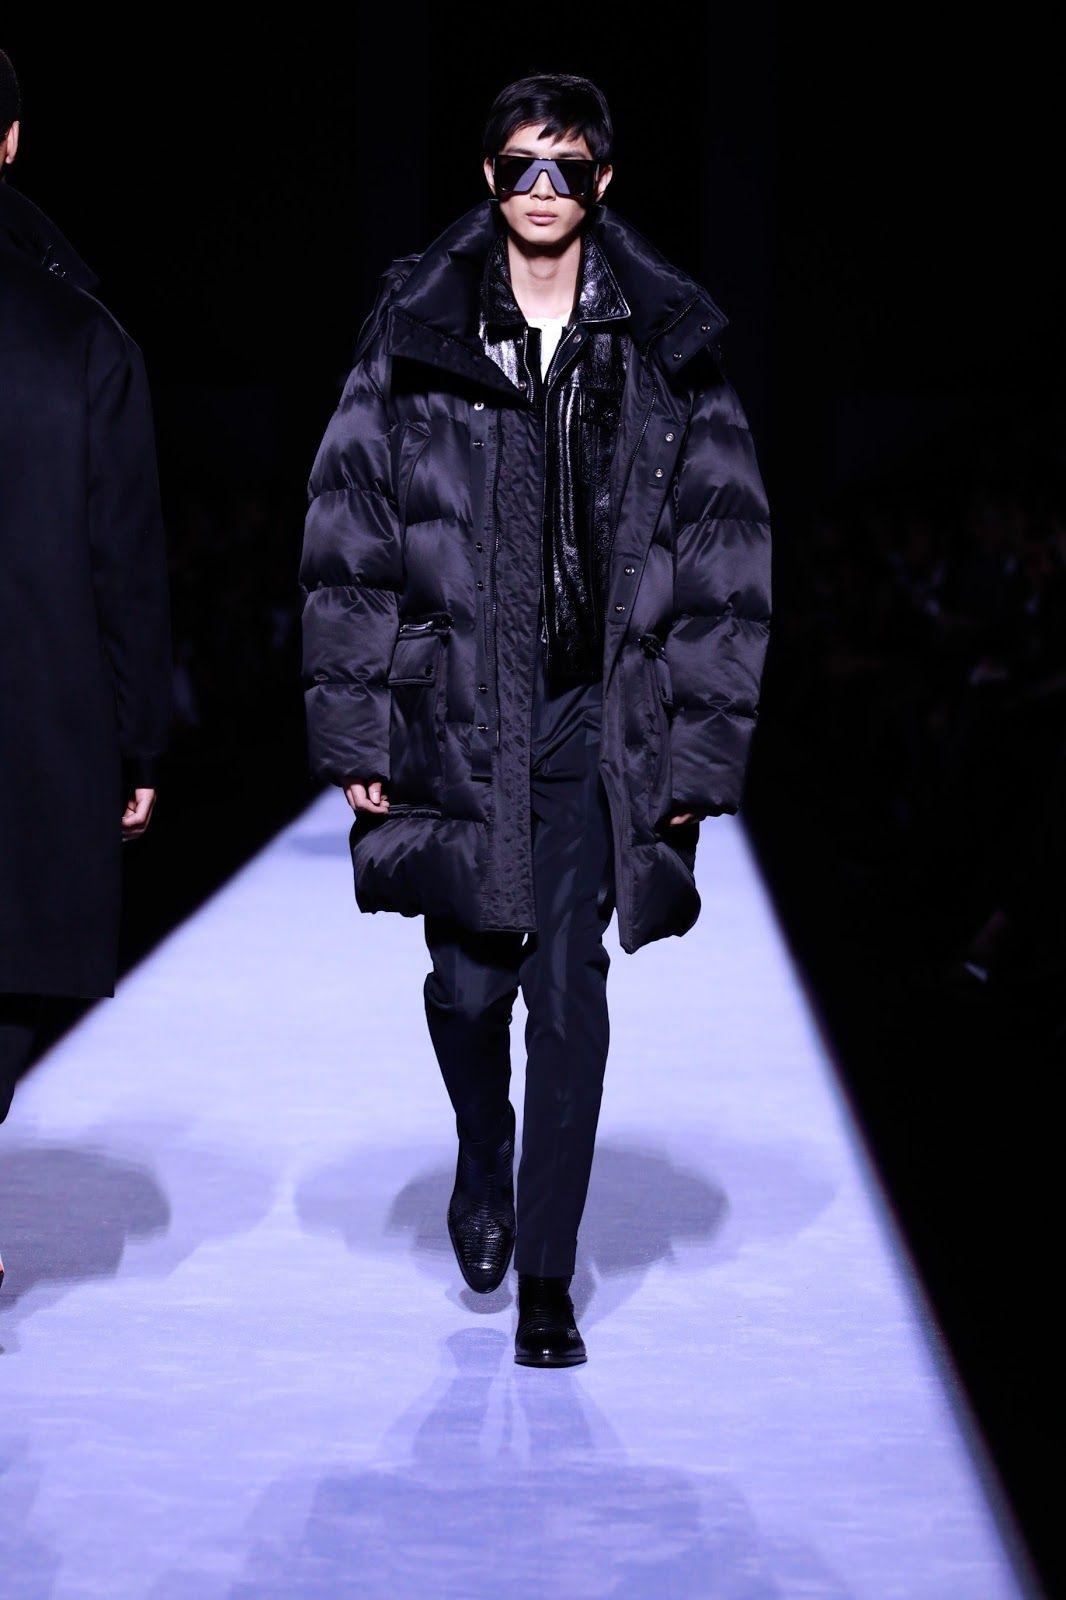 a7a3b68b2c9 Tom Ford Menswear Fall Winter 2018 2019